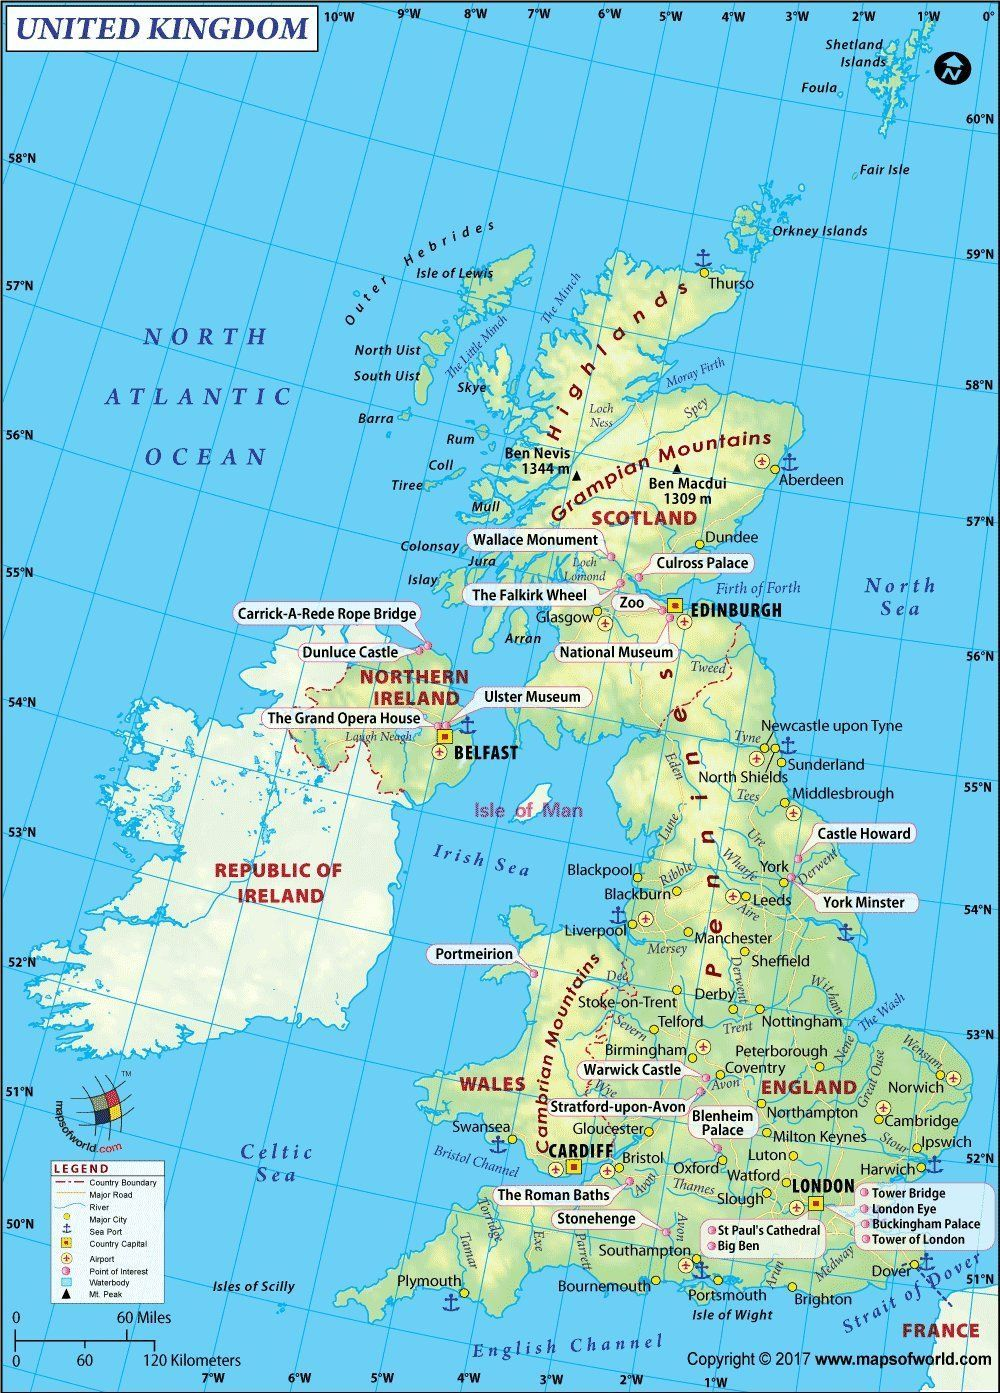 Moi amz on mad moi amz on map picturescity mapshd pictureengland ukworld gumiabroncs Choice Image